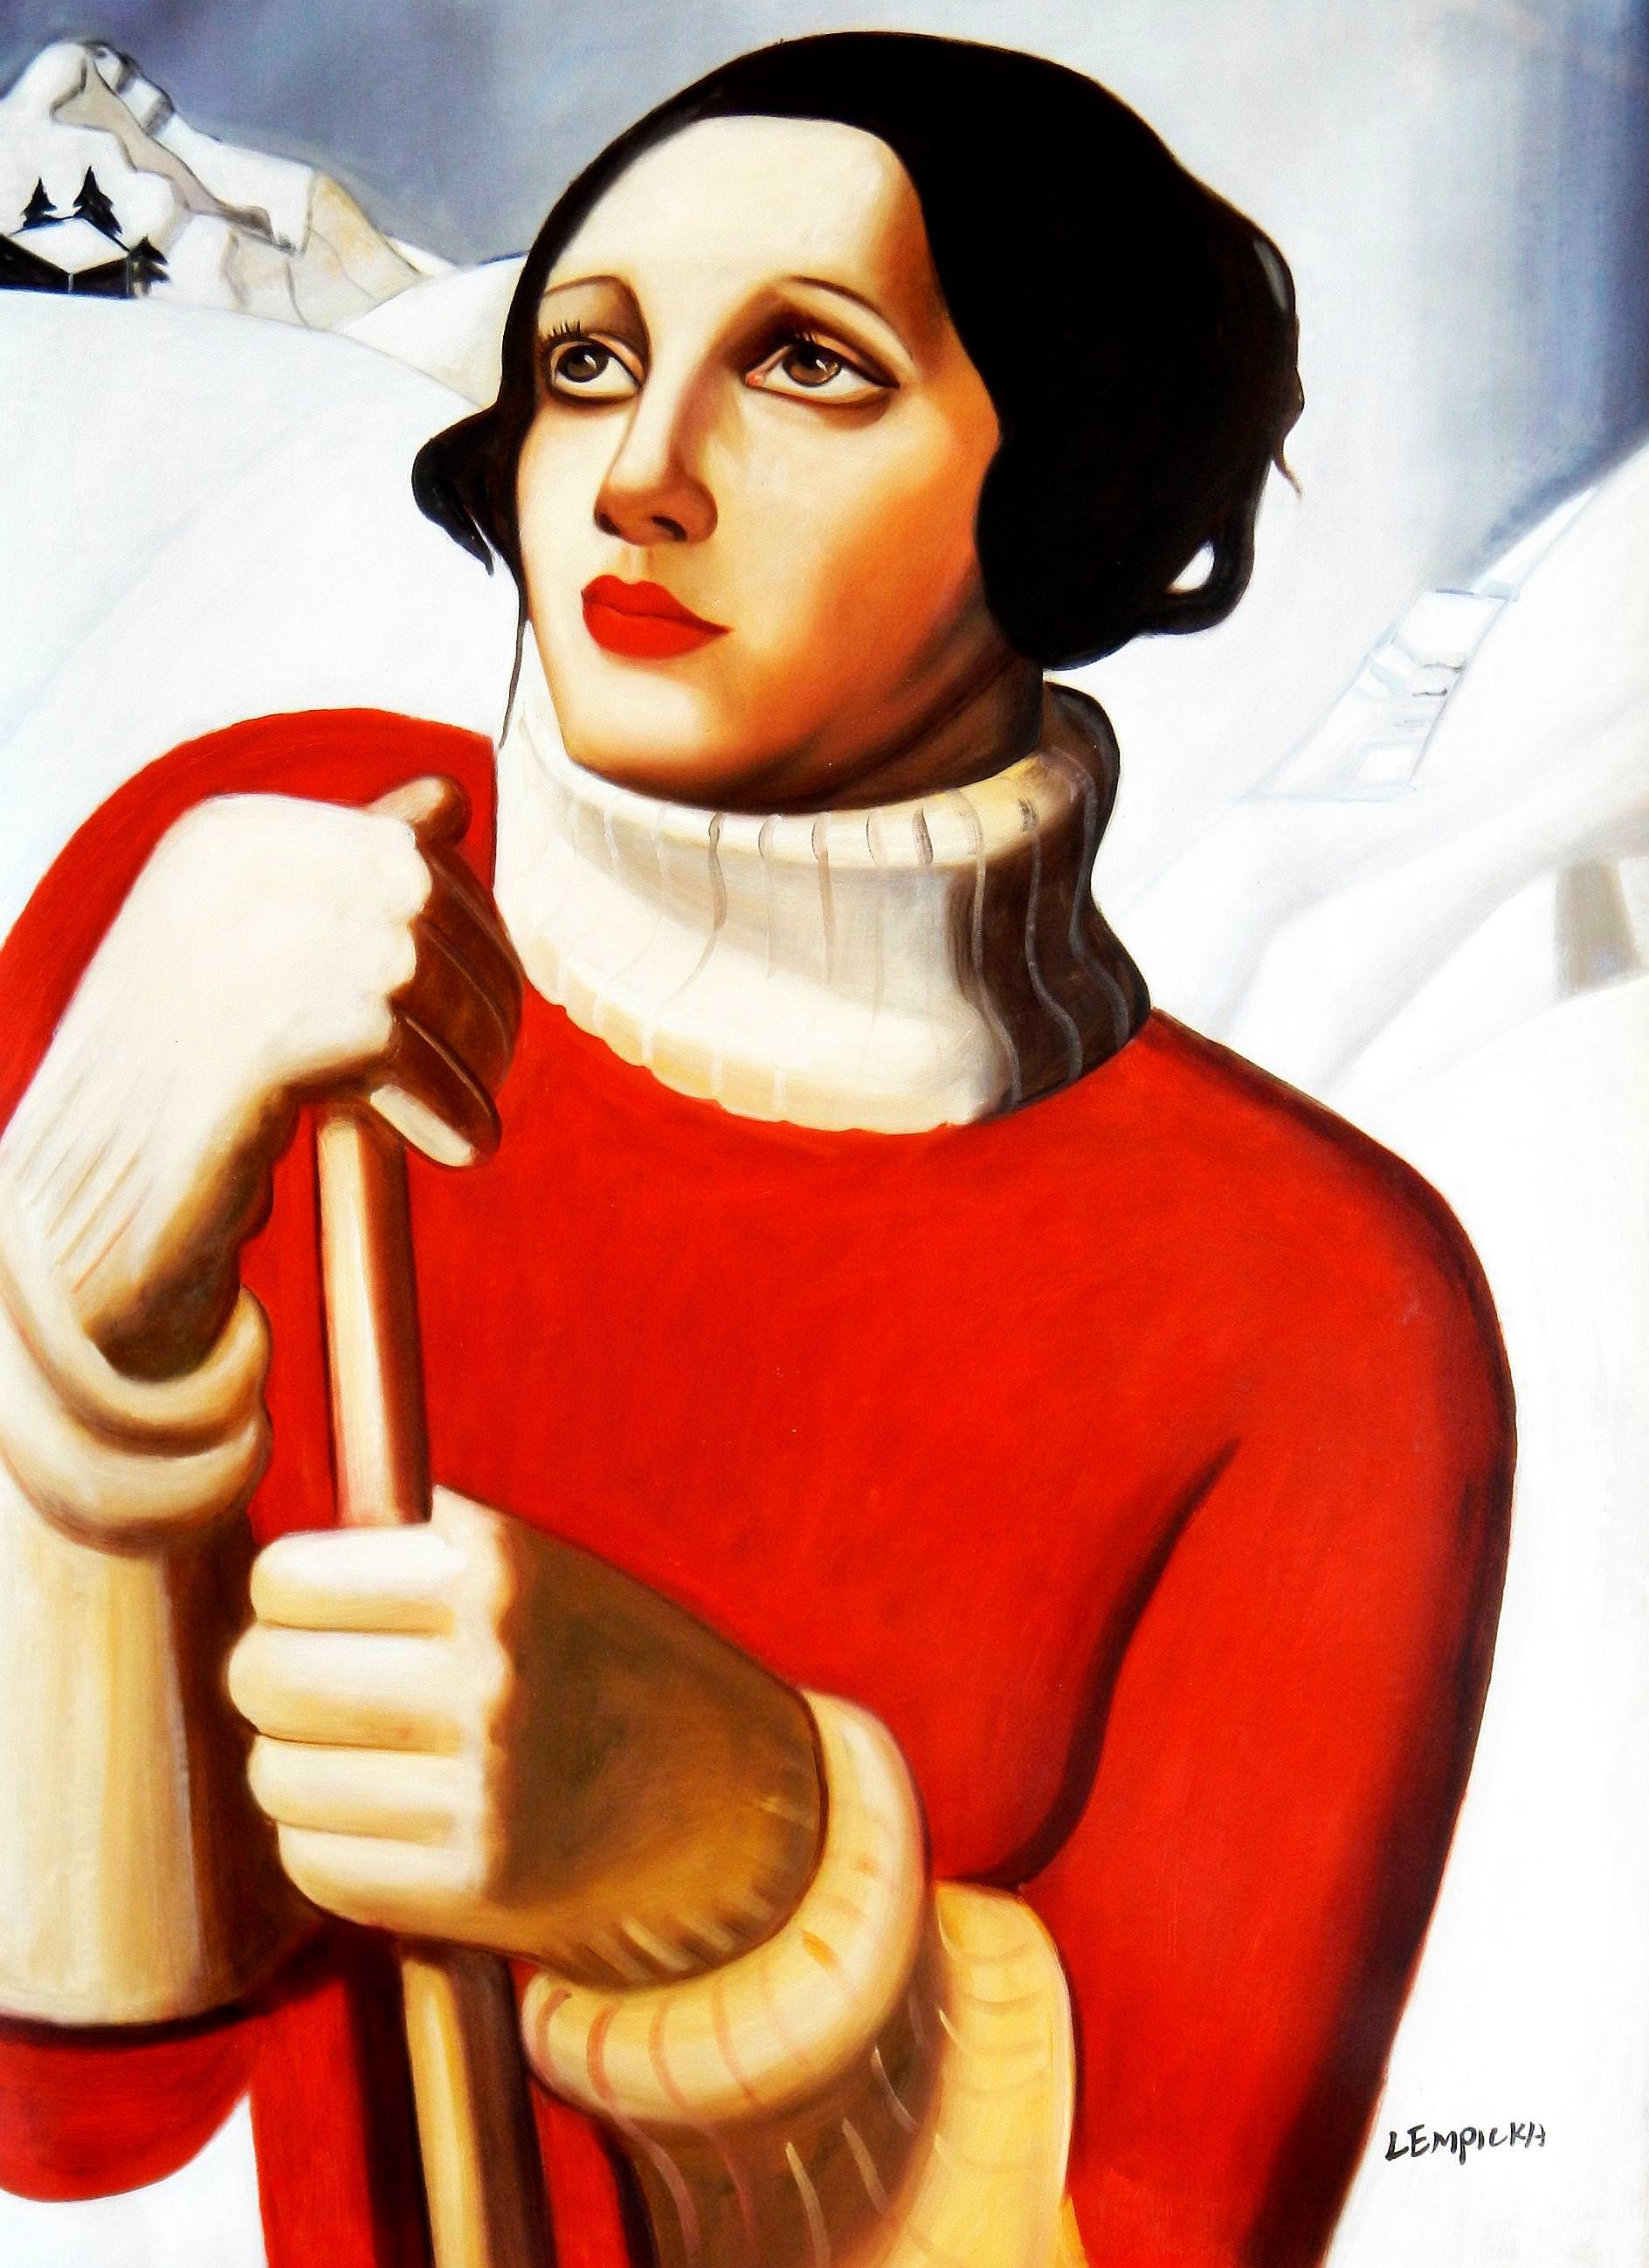 Homage to T. Lempicka - Sain Moritz i92965 80x110cm handgemaltes Gemälde